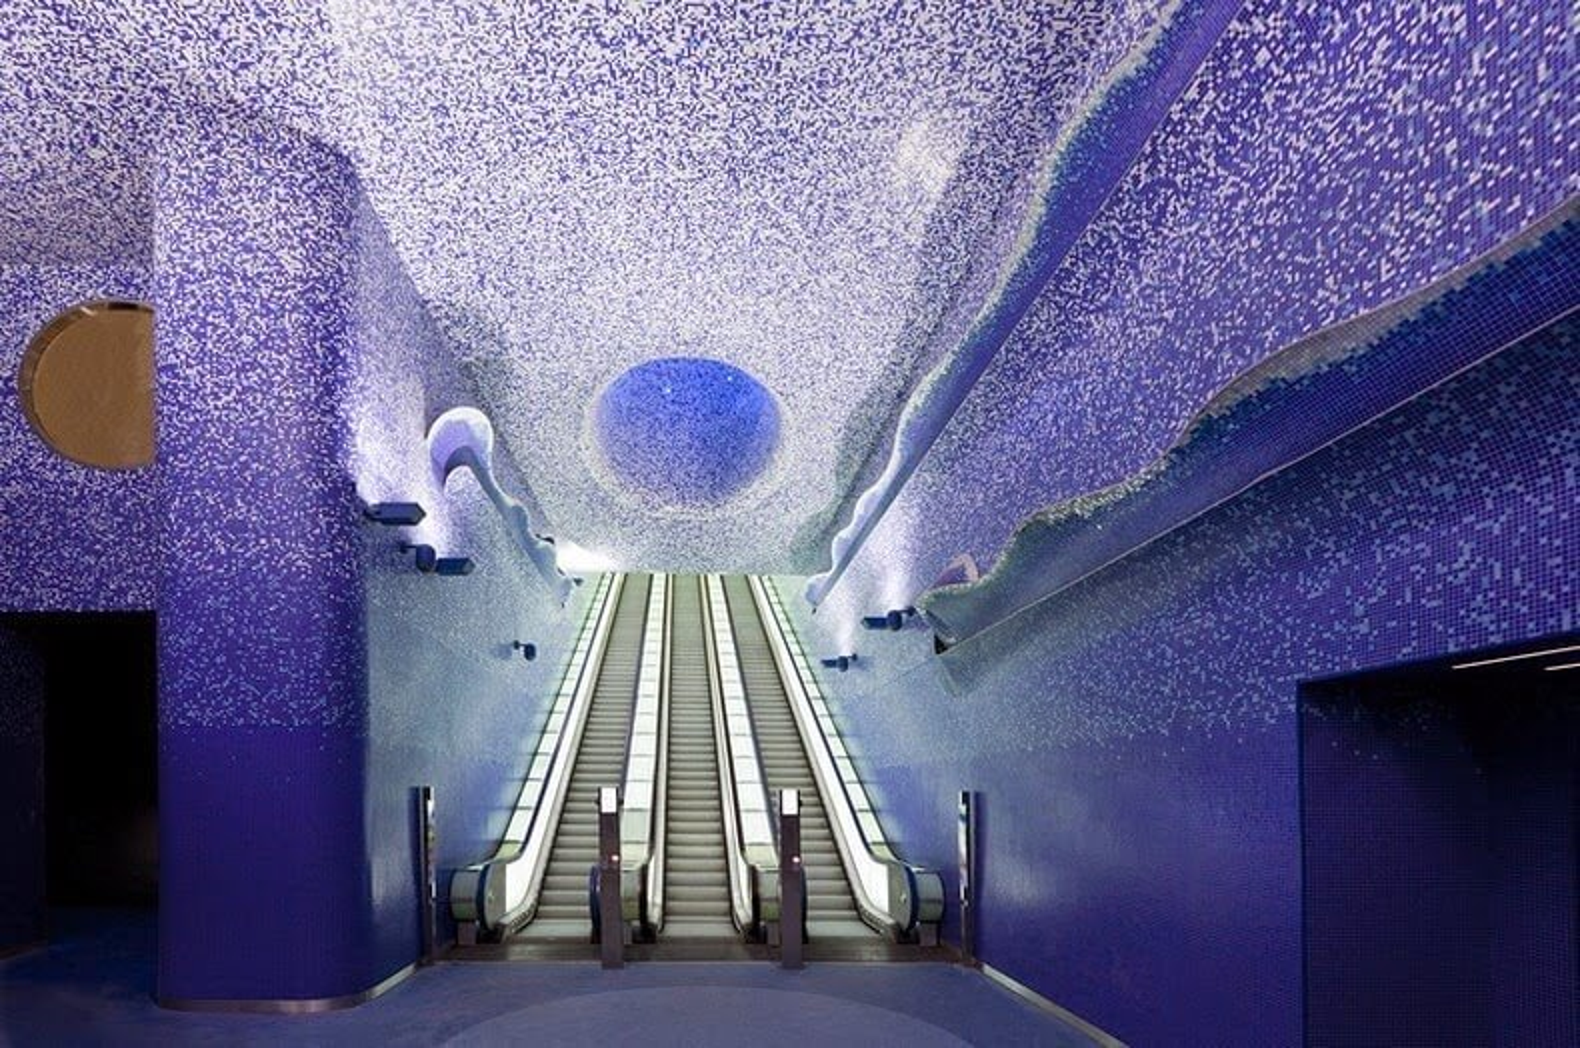 Les stations de métro de Naples converties en galeries d'art